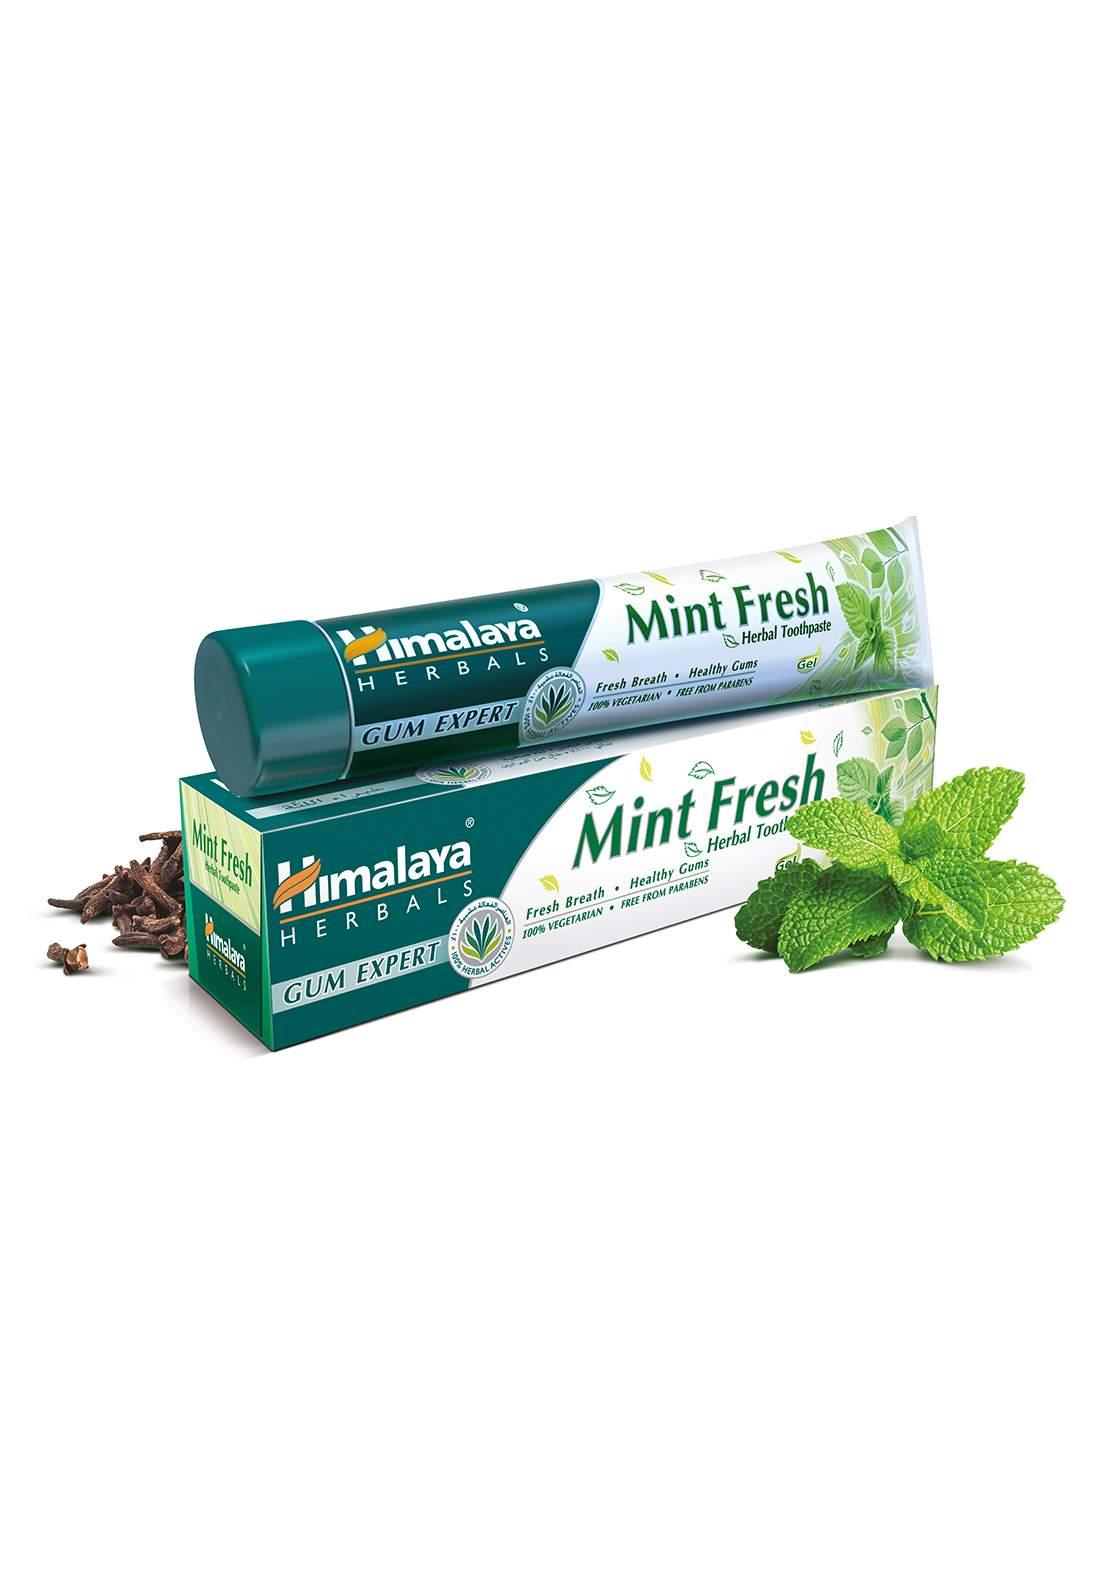 Toothpaste - Mint Fresh 125g هيمالايا معجون أسنان عشبي بإنتعاش النعناع